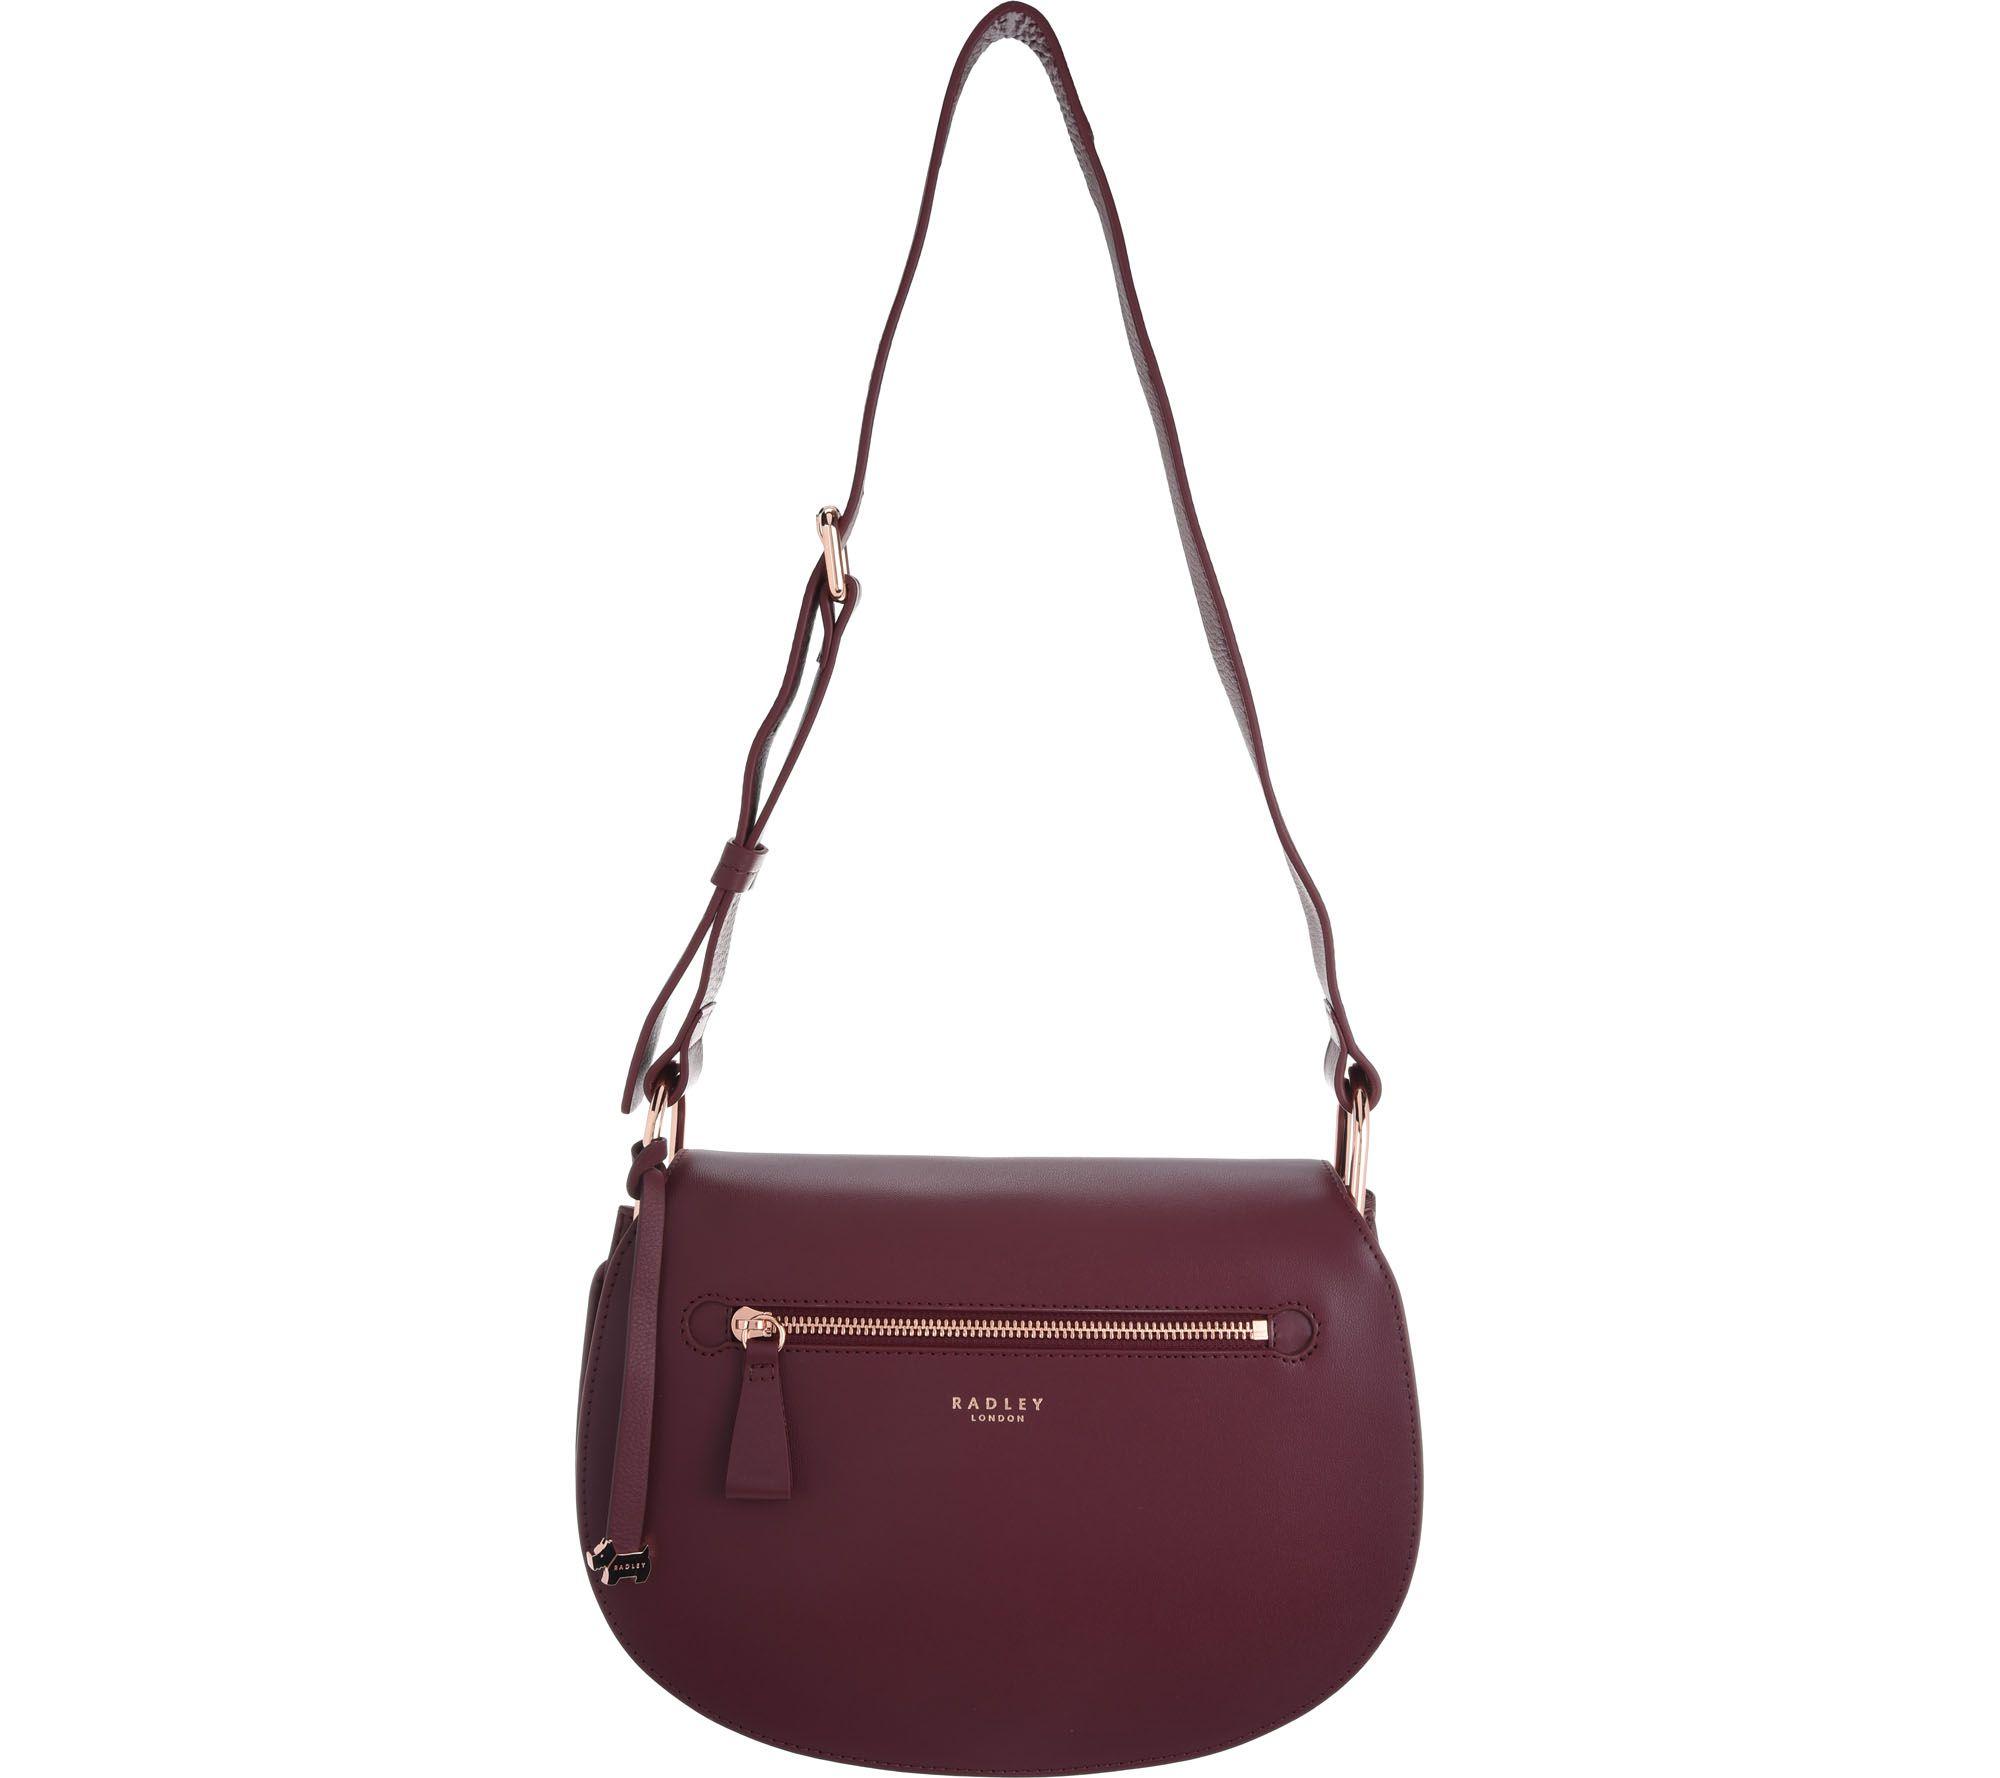 As Is Radley London Camley Street Medium Leathershoulder Handbag Qvc